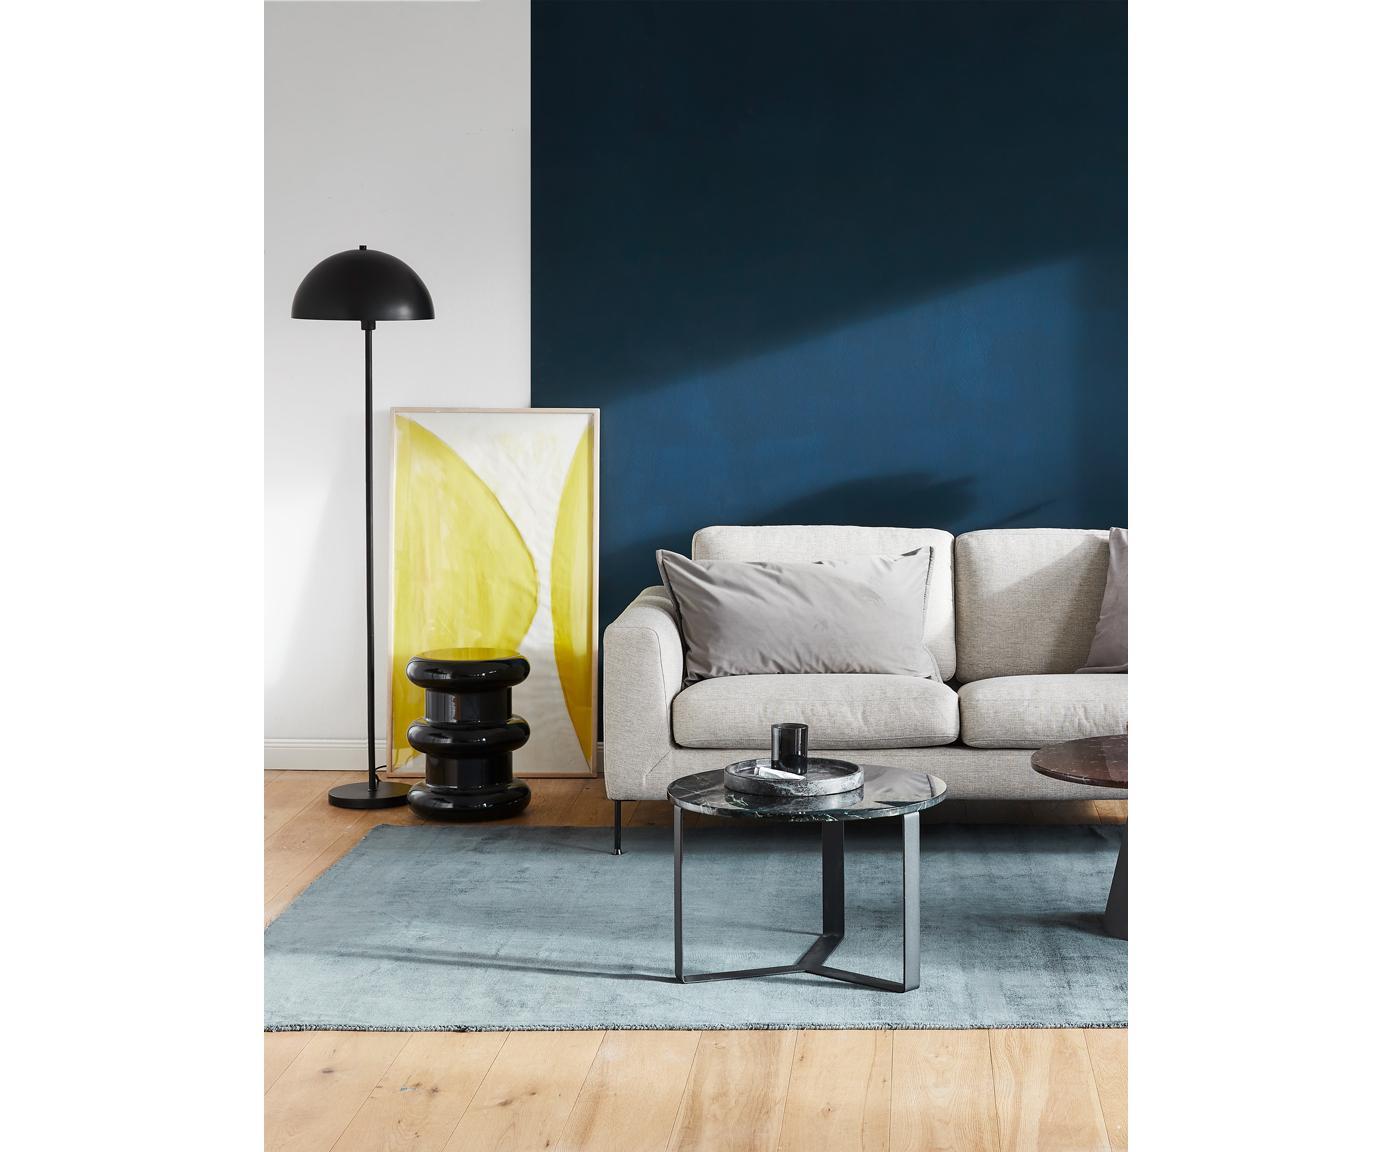 Vloerlamp Matilda, Lampenkap: gepoedercoat metaal, Lampvoet: gepoedercoat metaal, Zwart, Ø 40 x H 164 cm